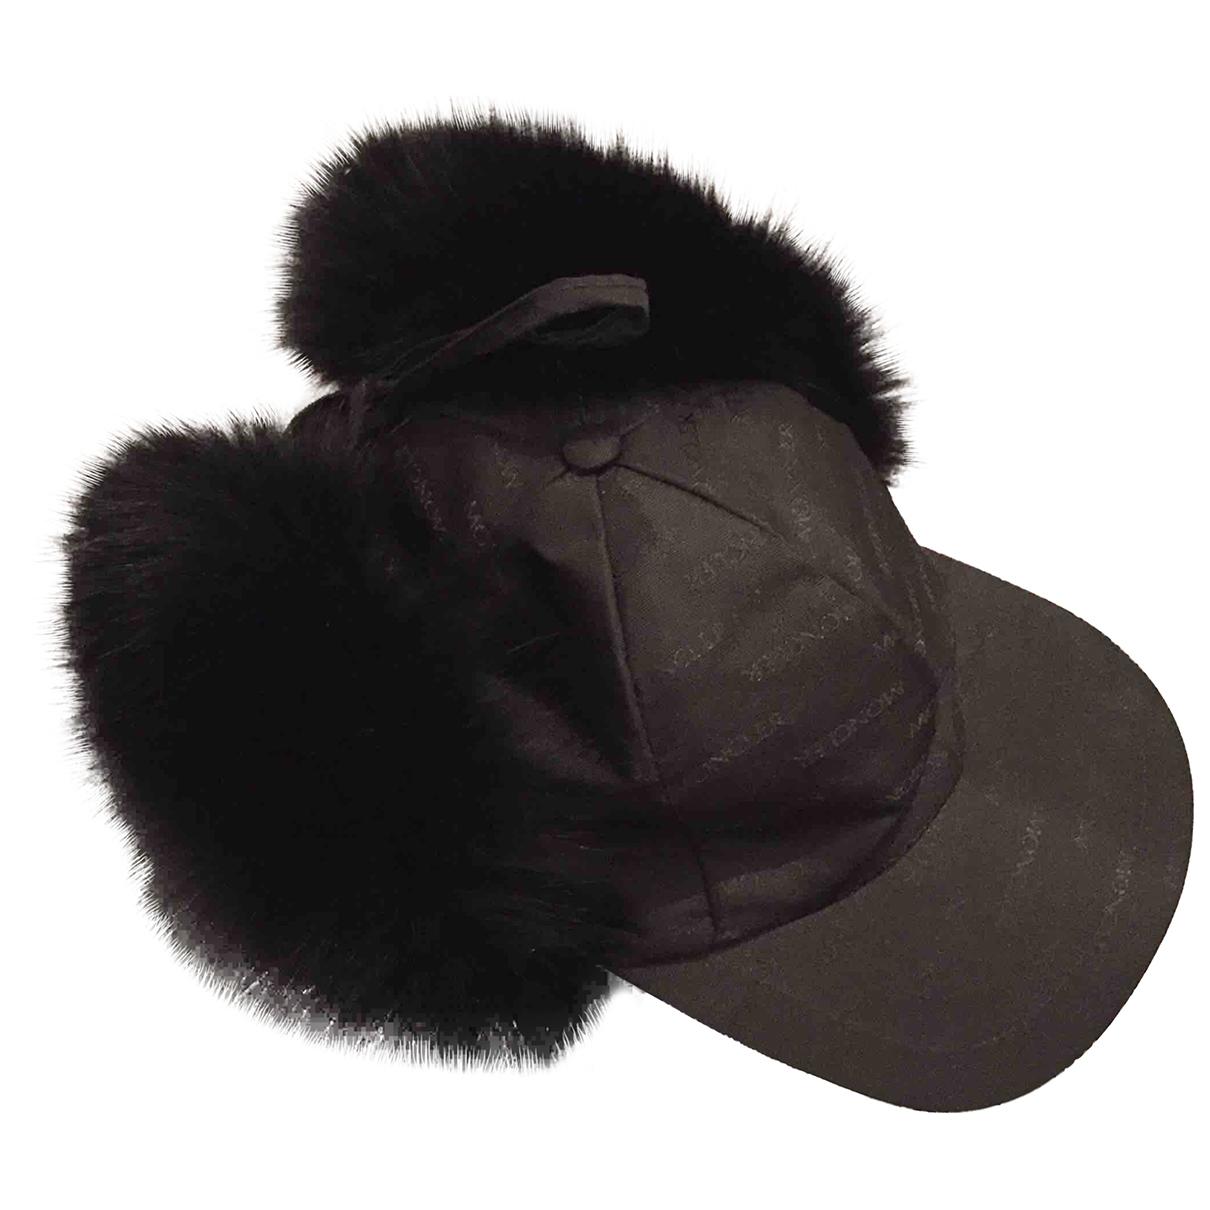 Moncler \N Black hat for Women M International